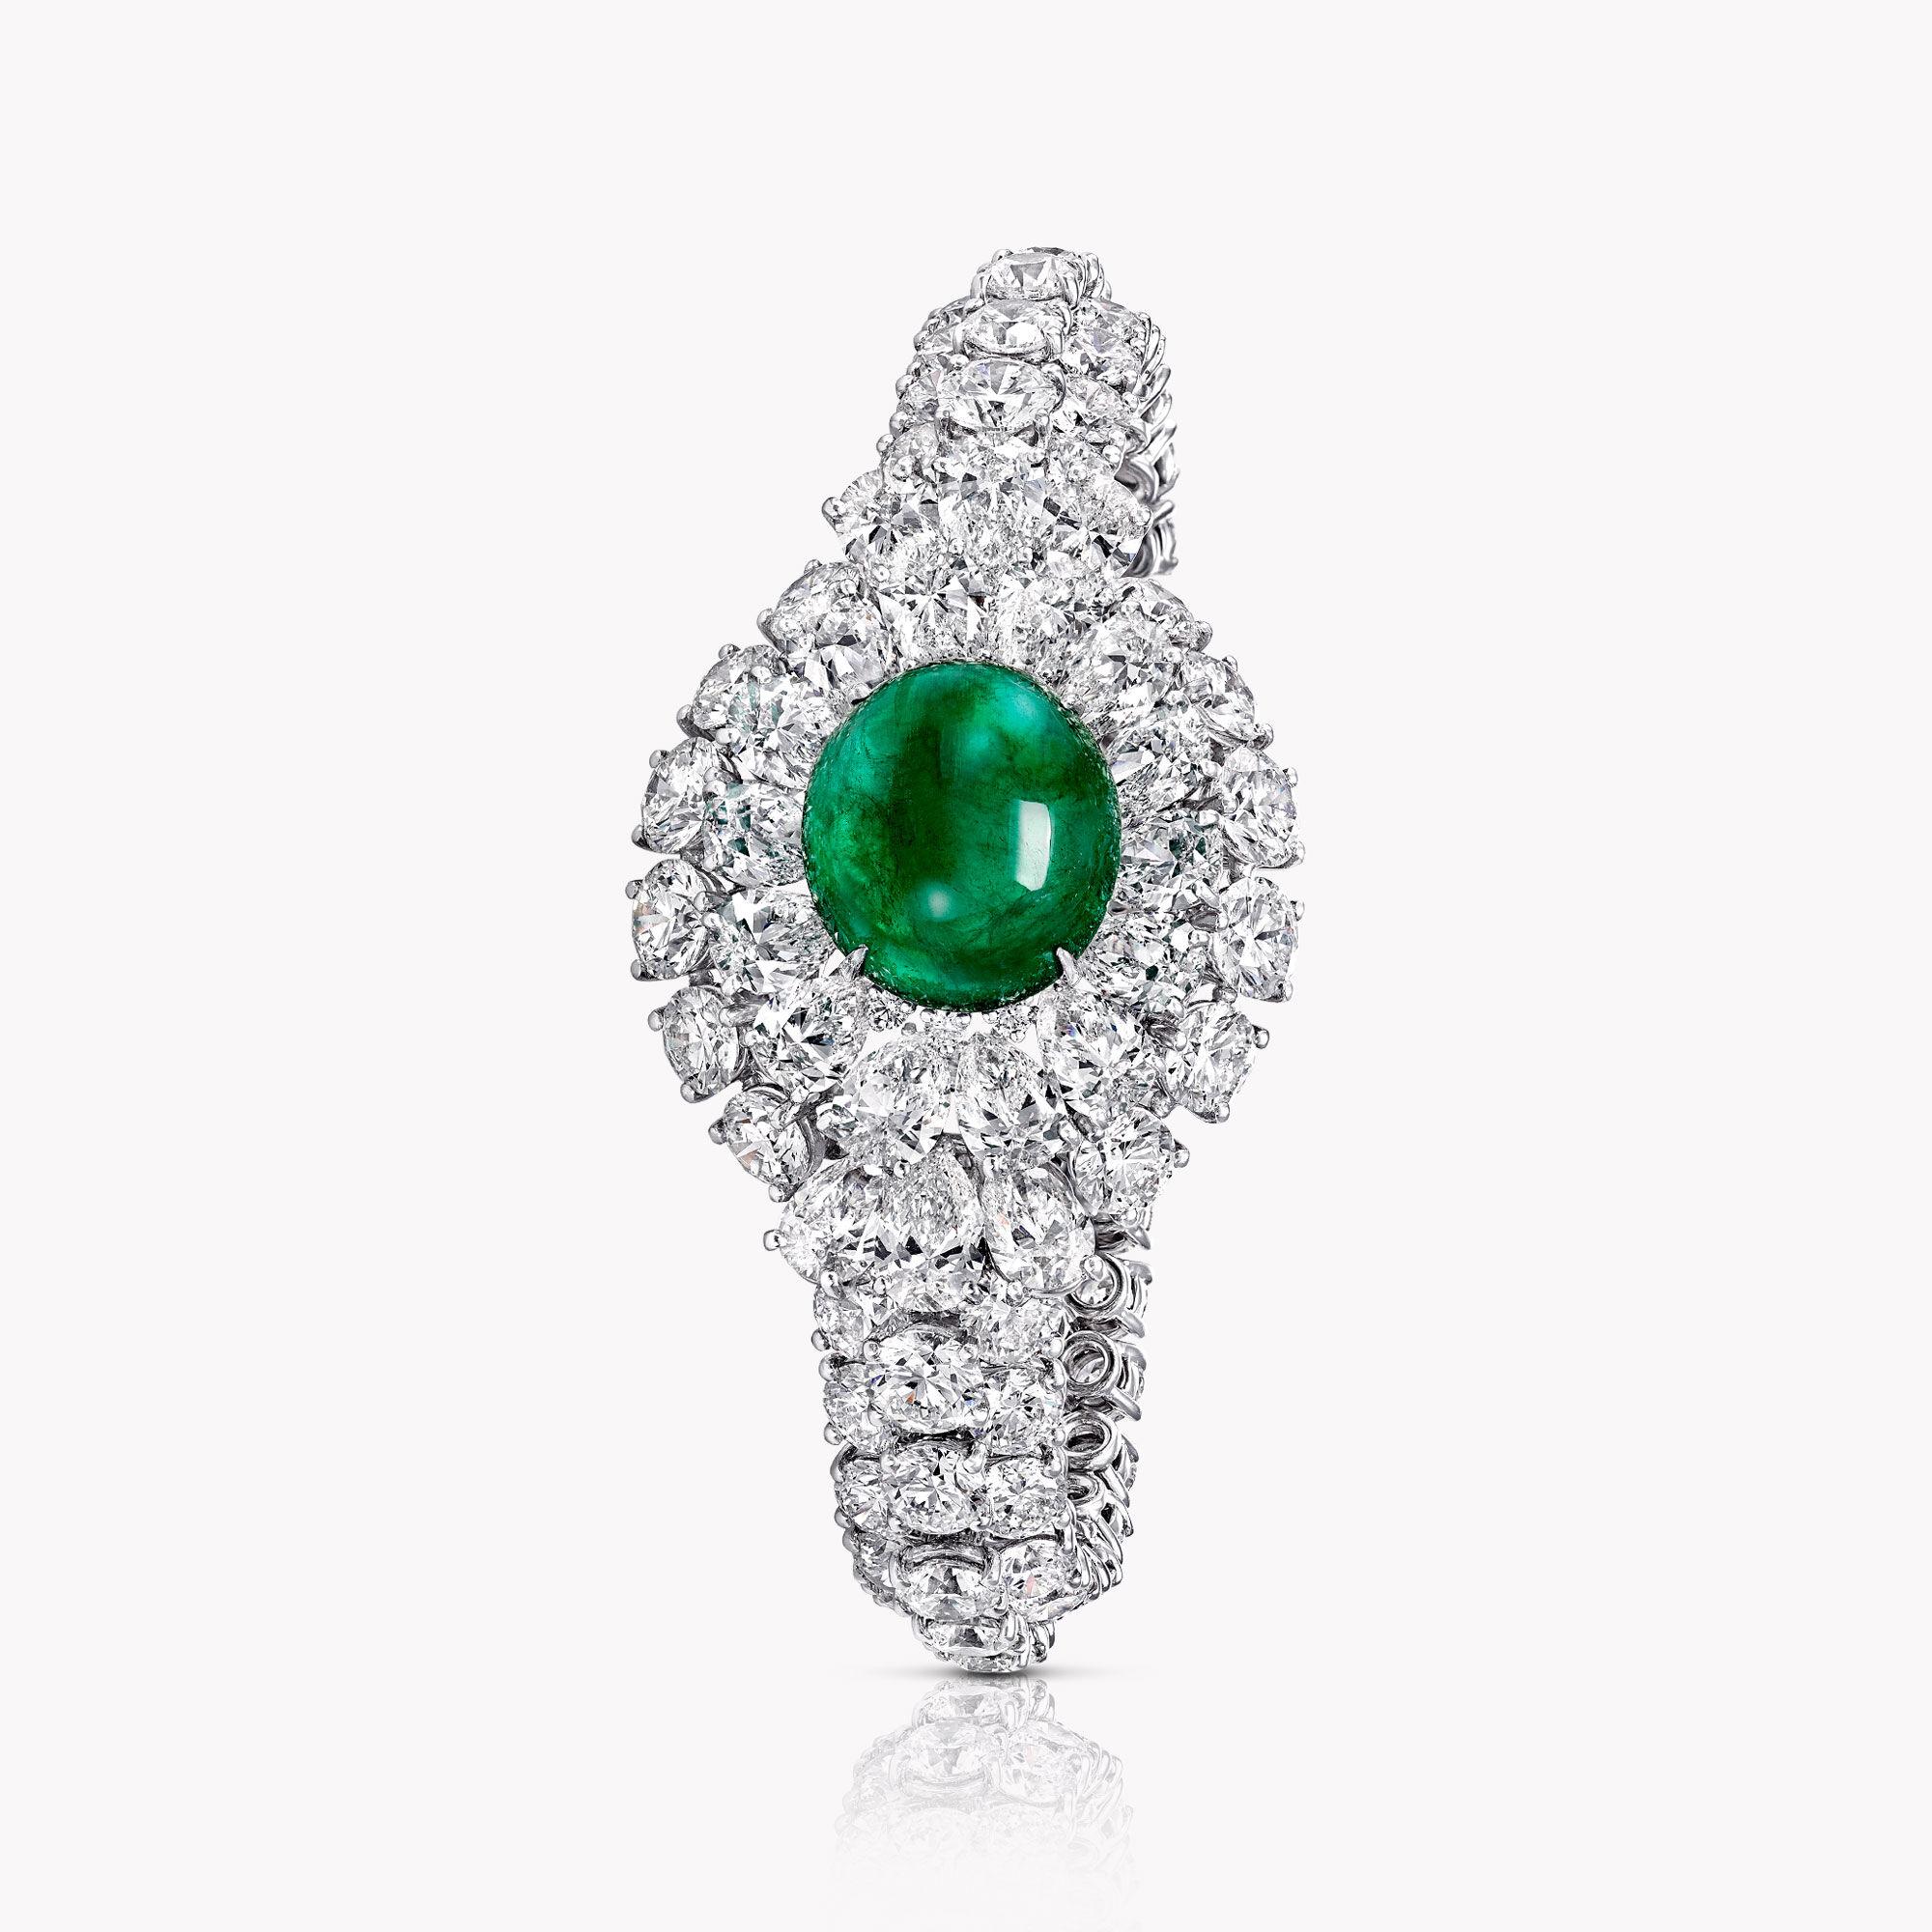 A Graff emerald and white diamond high jewellery bracelet